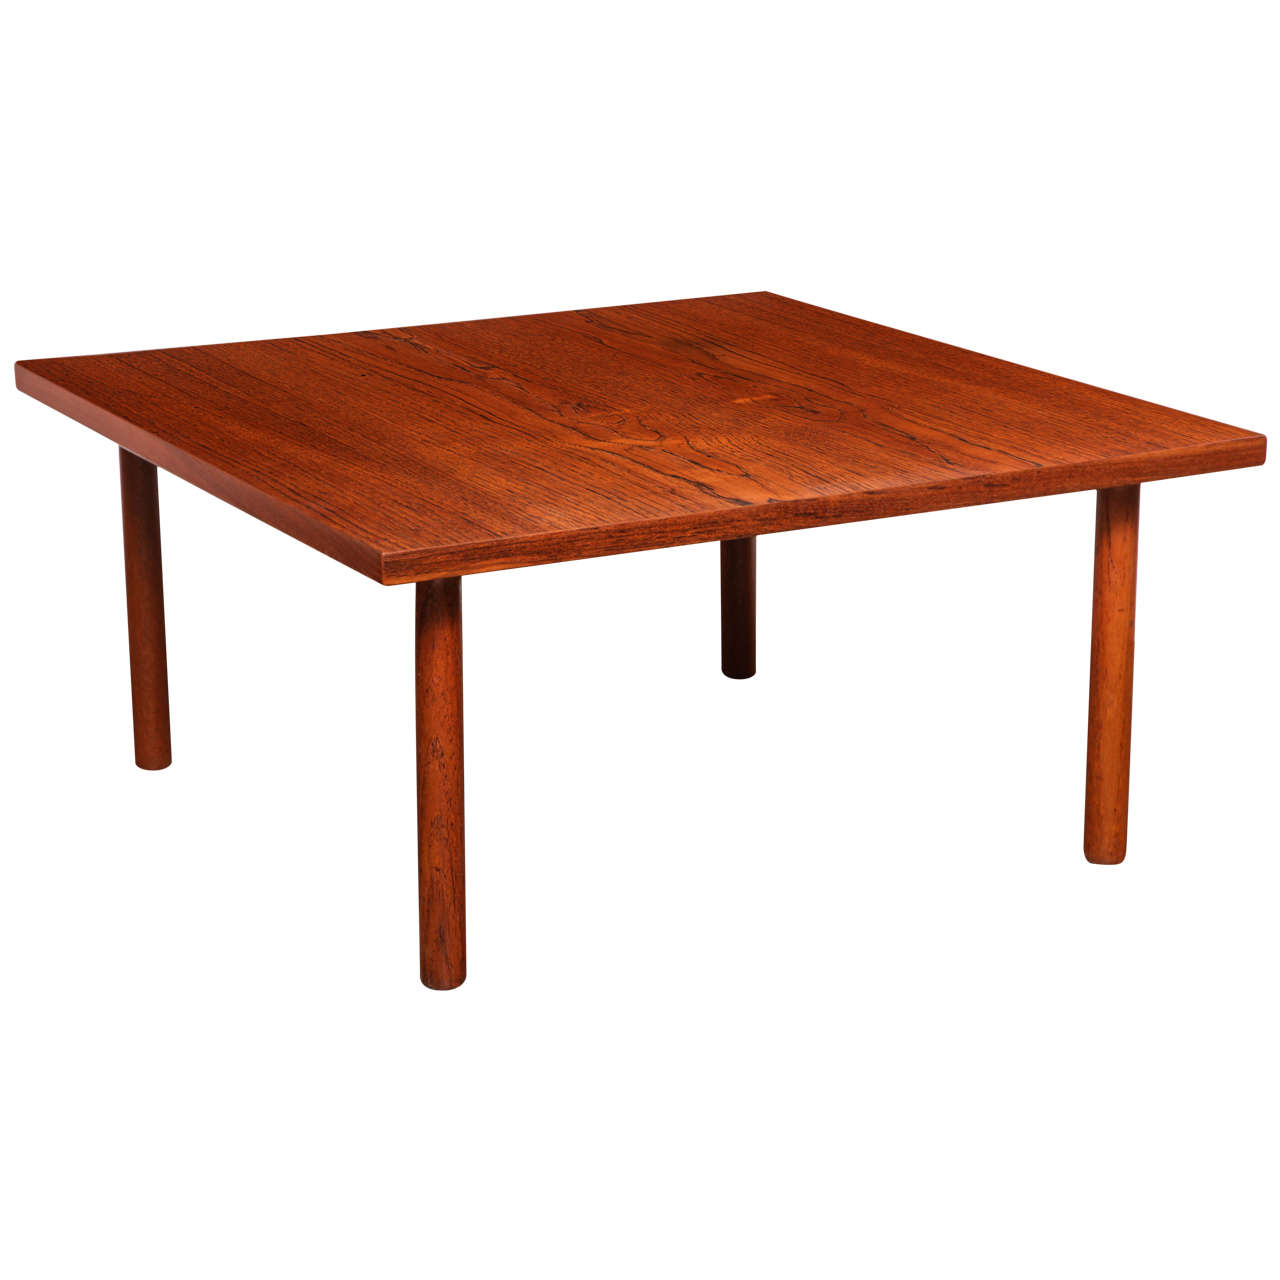 Hans Wegner Teak Side Or Coffee Table By Getama 1960s For Sale At 1stdibs